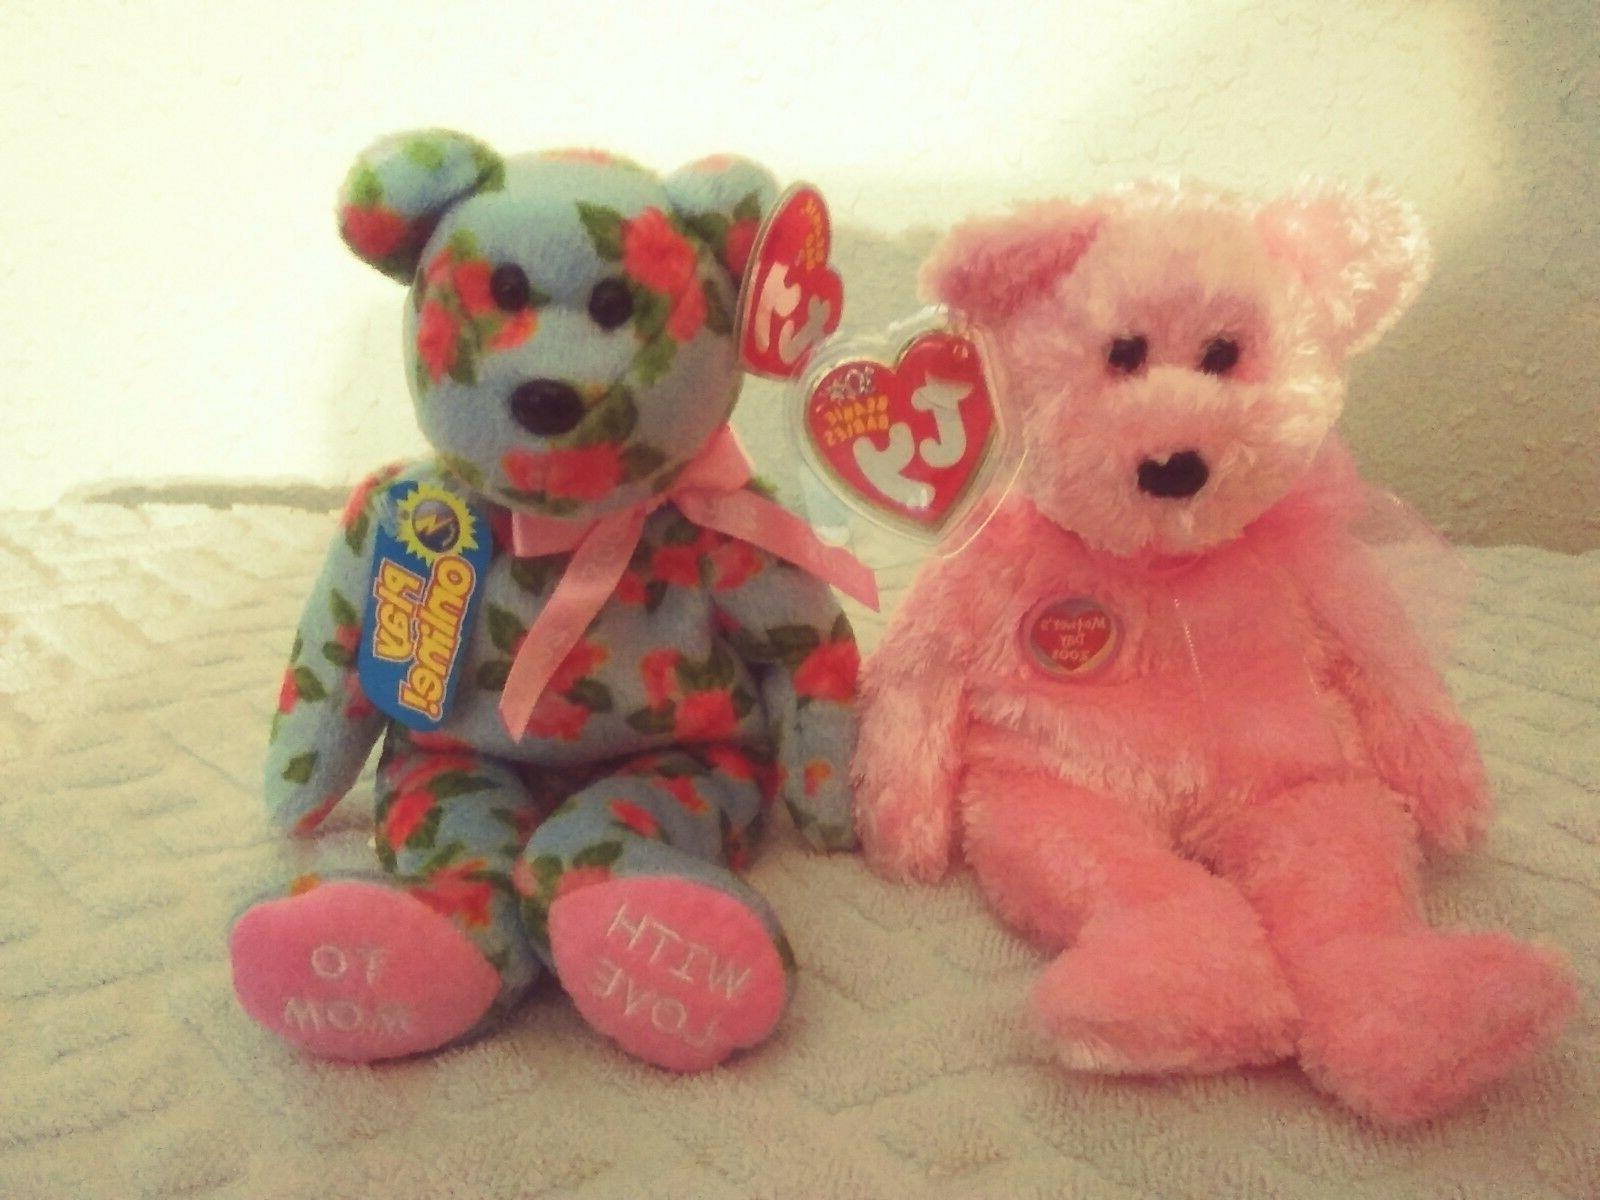 beanie babies plush original stuffed animals 2003